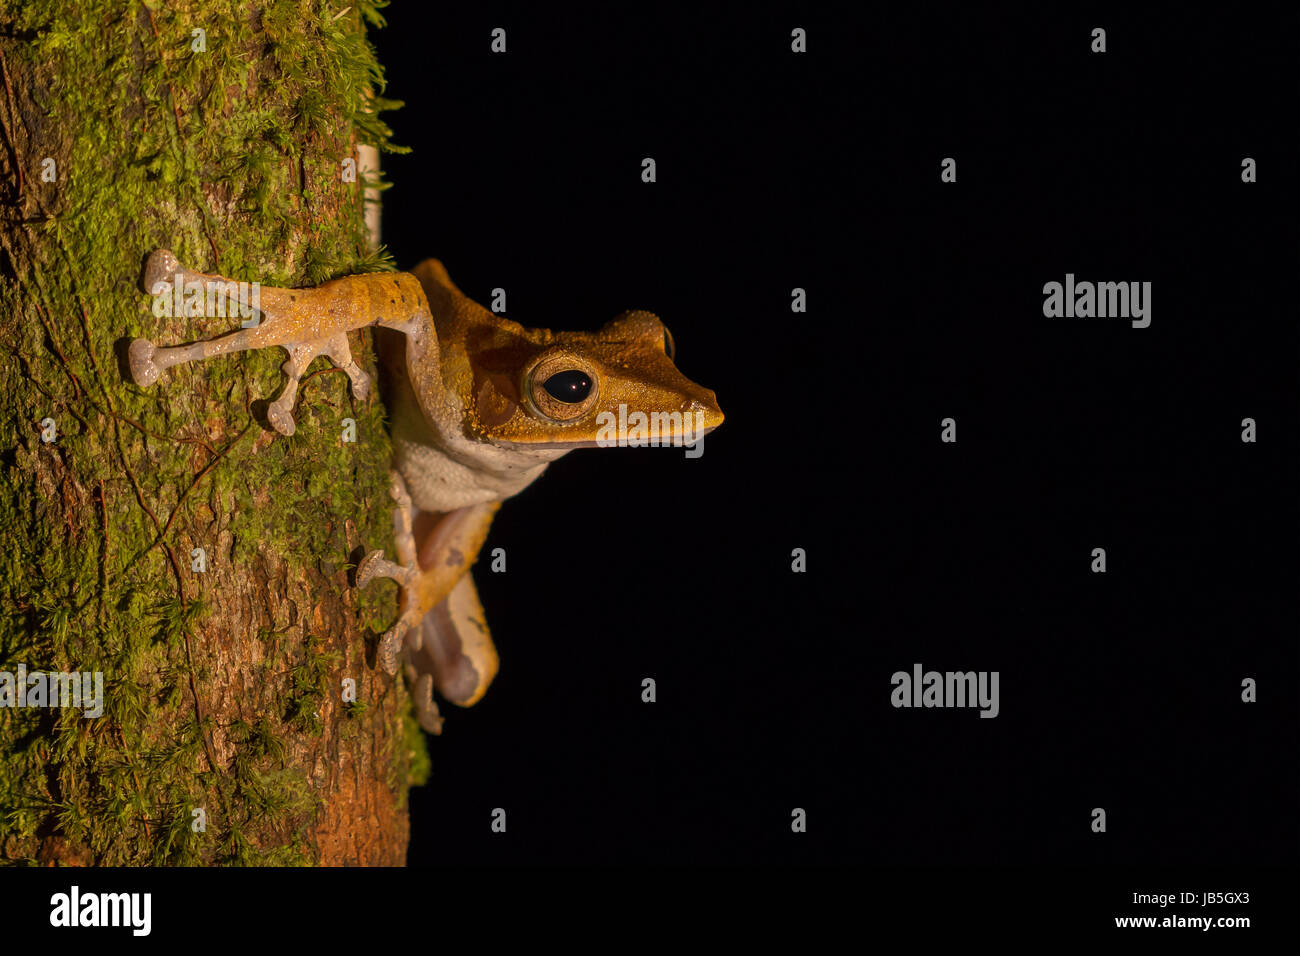 Dark eared tree frog (Polypedates macrotis) looking for food at night in Ulu Temburong National Park, Brunei - Stock Image